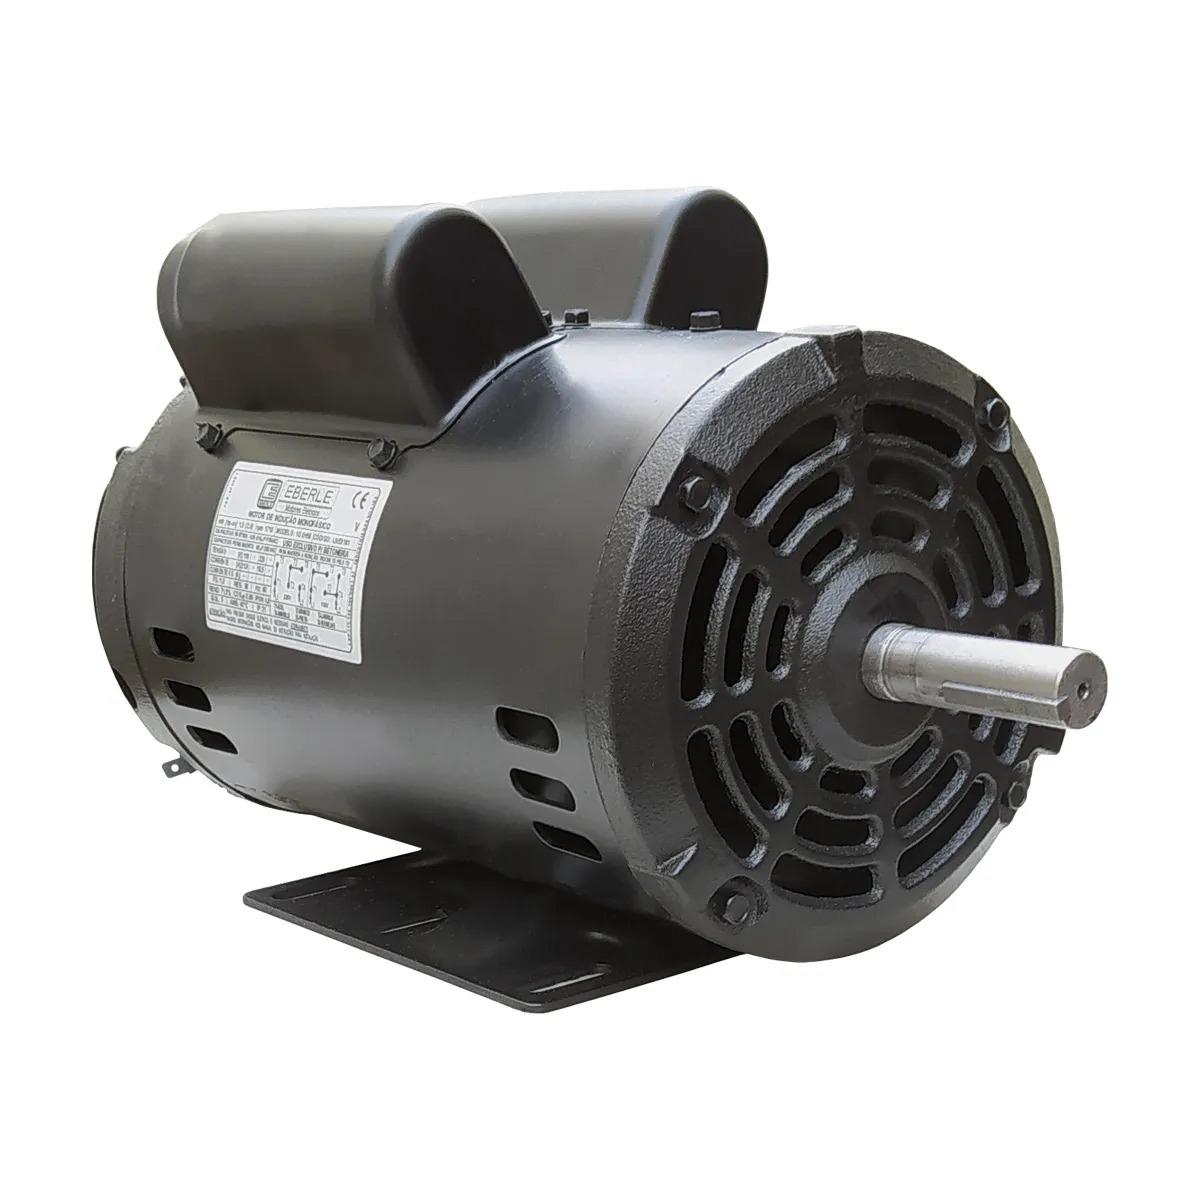 Motor Elétrico 1cv Baixa Rotação Monofásico 4 Polos Aberto Eberle Mercosul